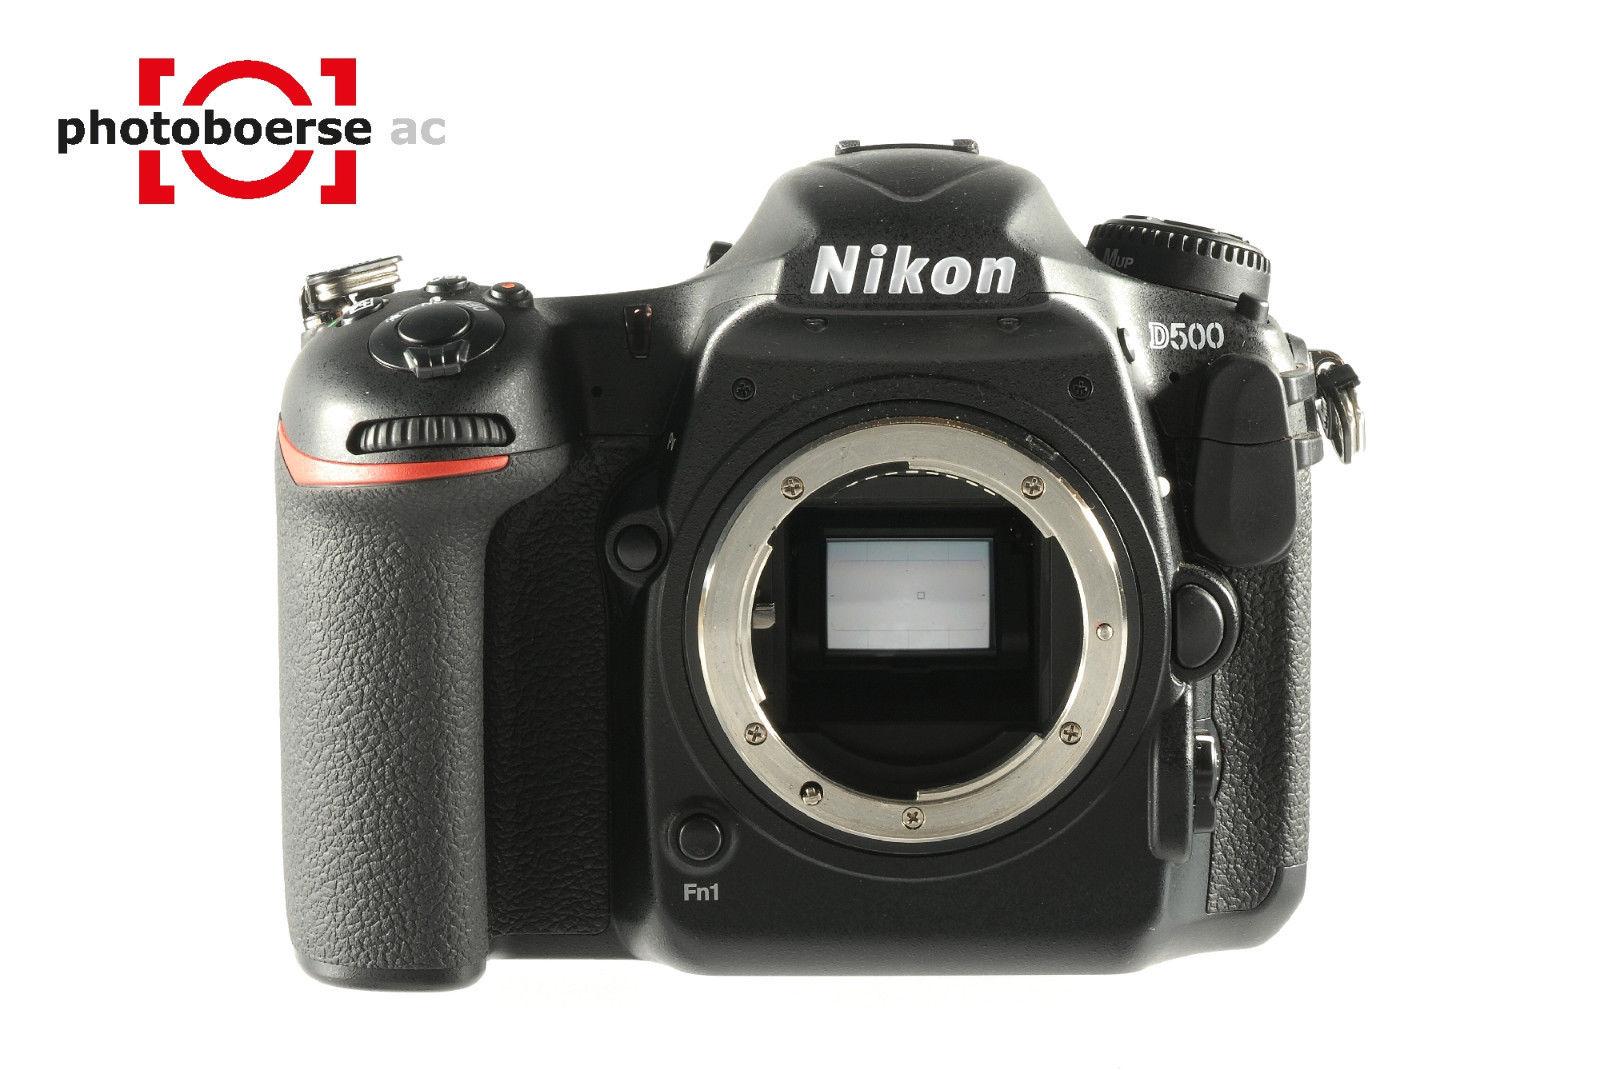 NIKON D500 mit 1.920 Auslösungen / actuations